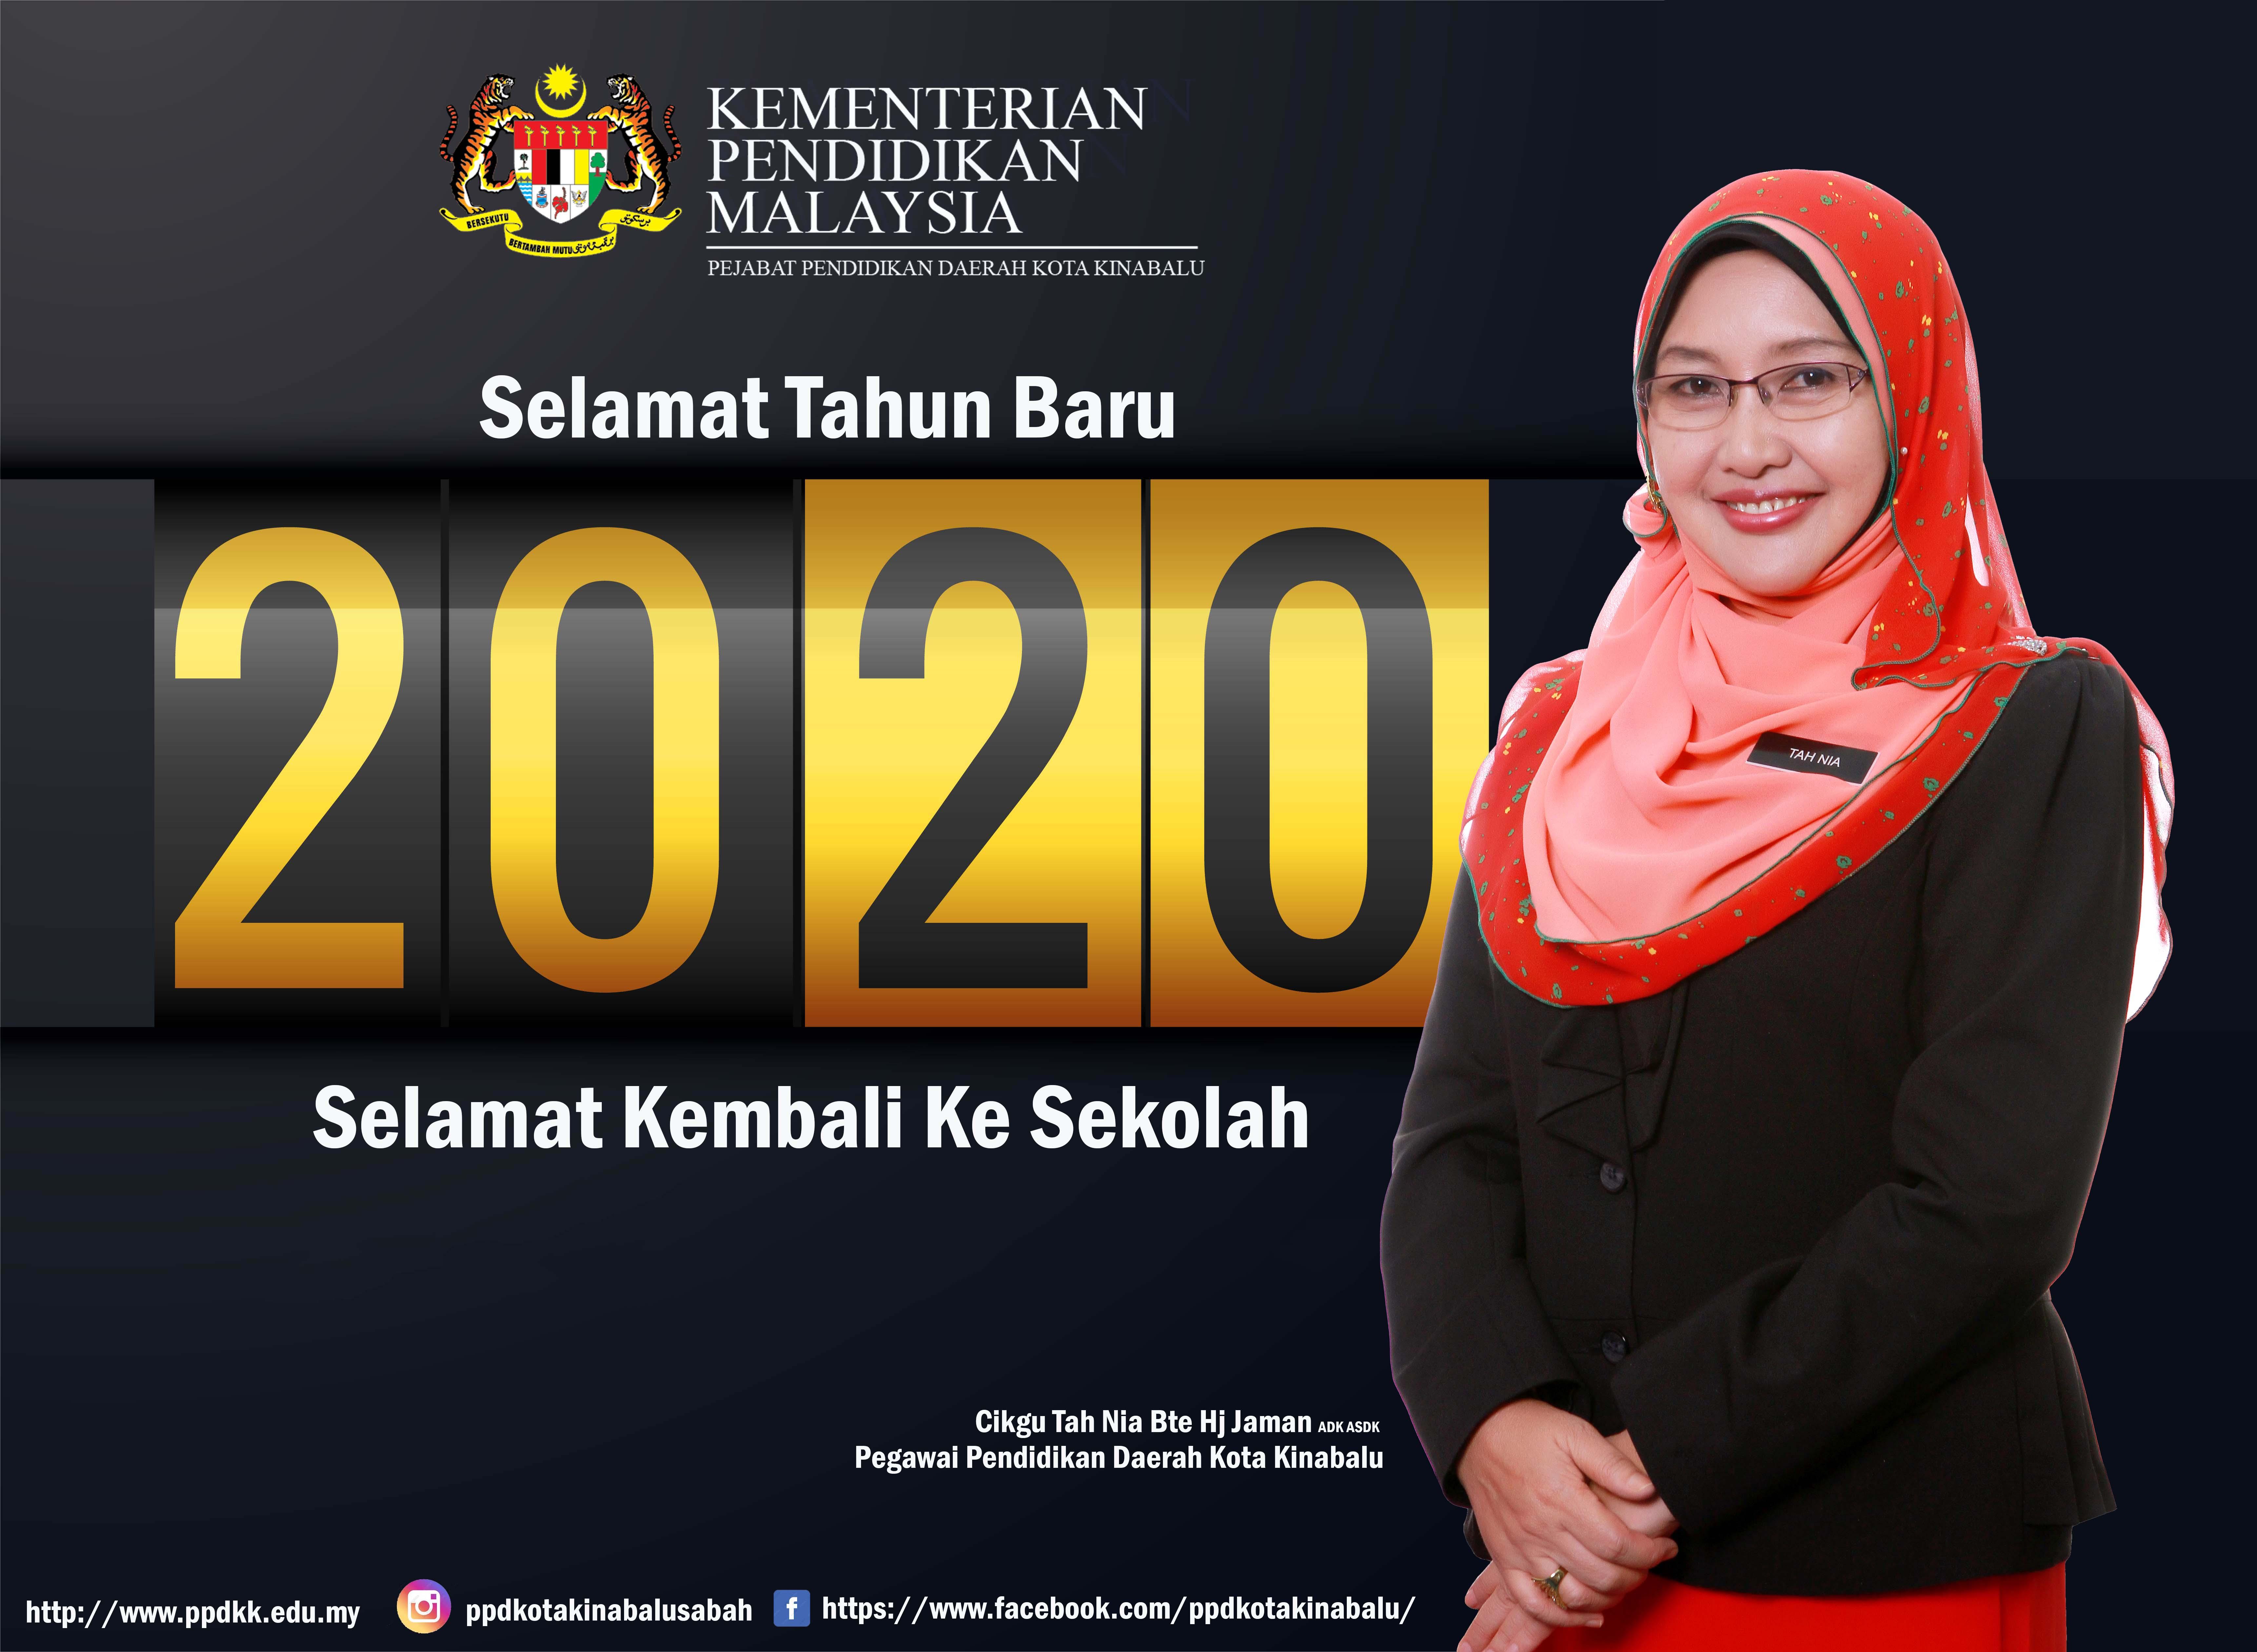 Selamat Tahun Baru 2020 Selamat Kembali Ke Sekolah Pejabat Pendidikan Daerah Kota Kinabalu